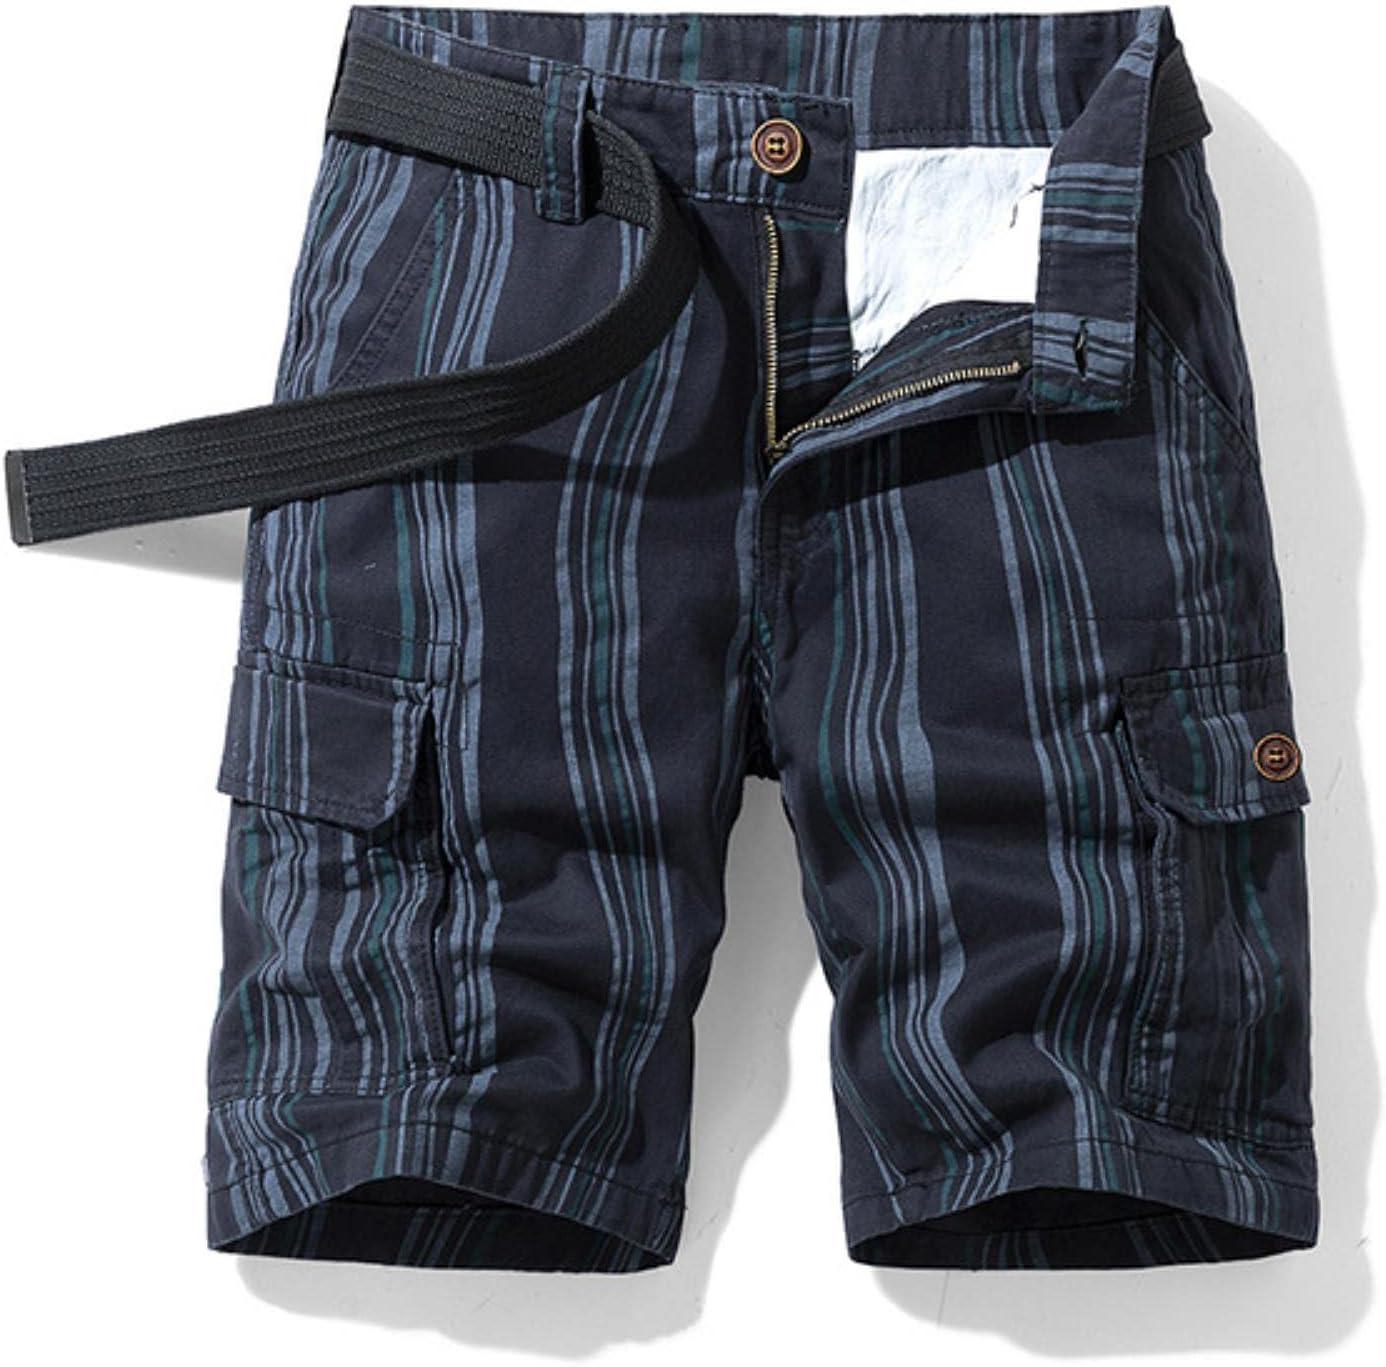 WoJogom 2021 Spring Men Cotton Cargo Shorts Clothing Summer Casual Breeches Fashion Beach Pants Cargo Short Men